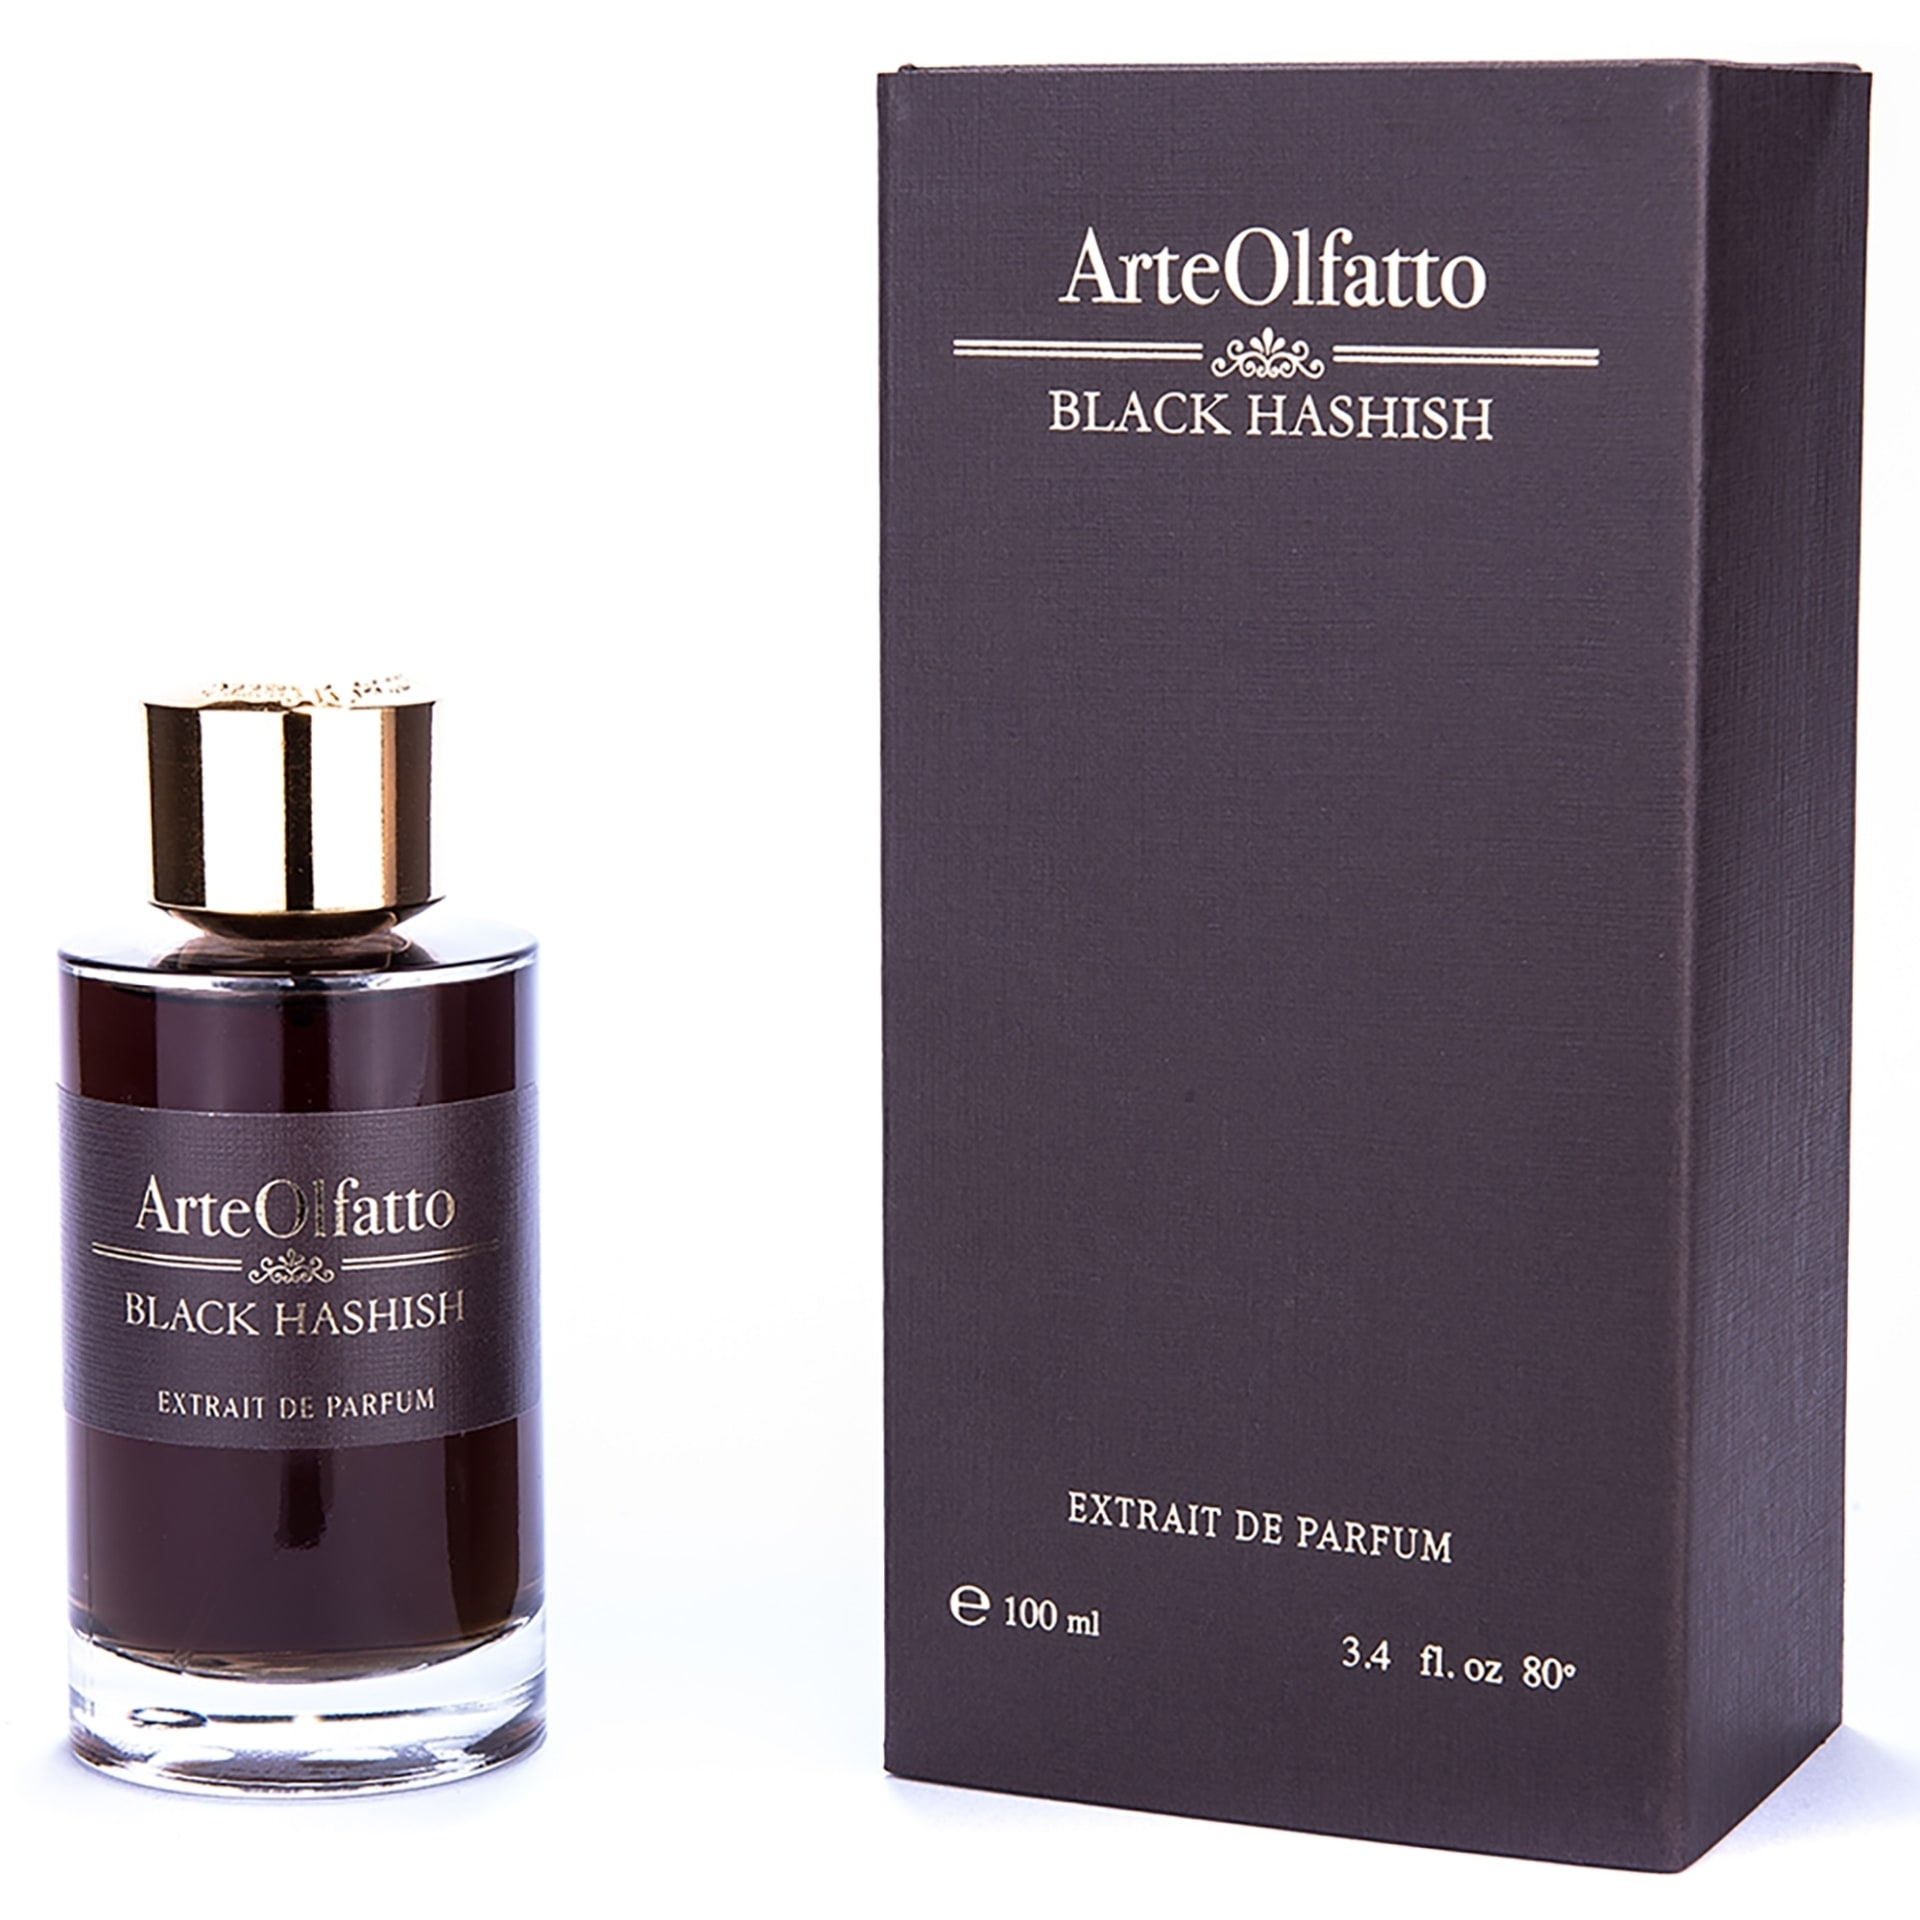 arteolfatto-black-hashish-2